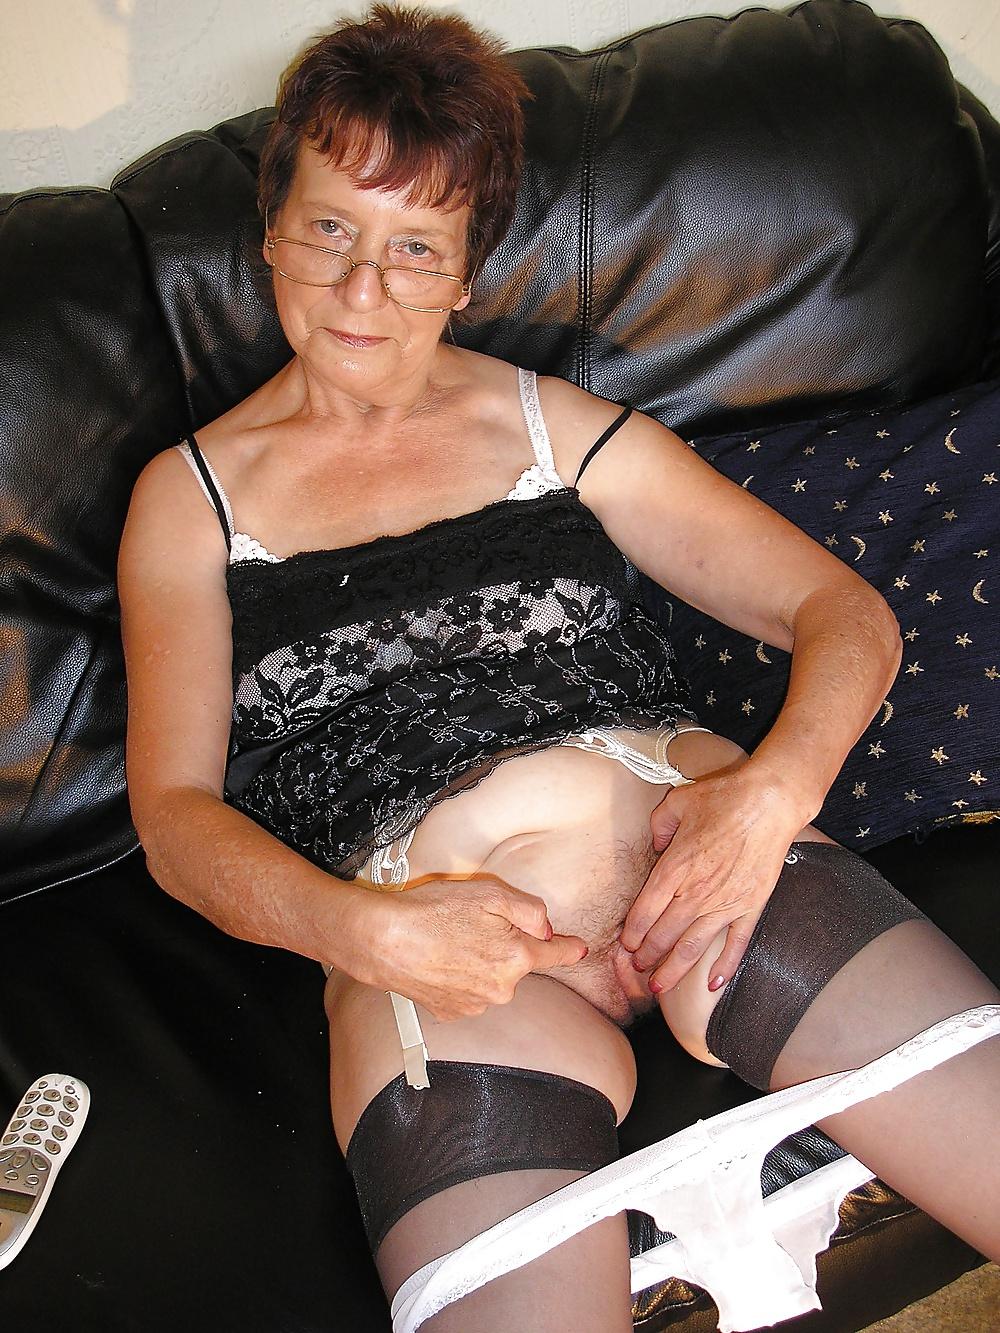 Fendom granny pussy Strict Femdom Granny - 12 Pics | xHamster